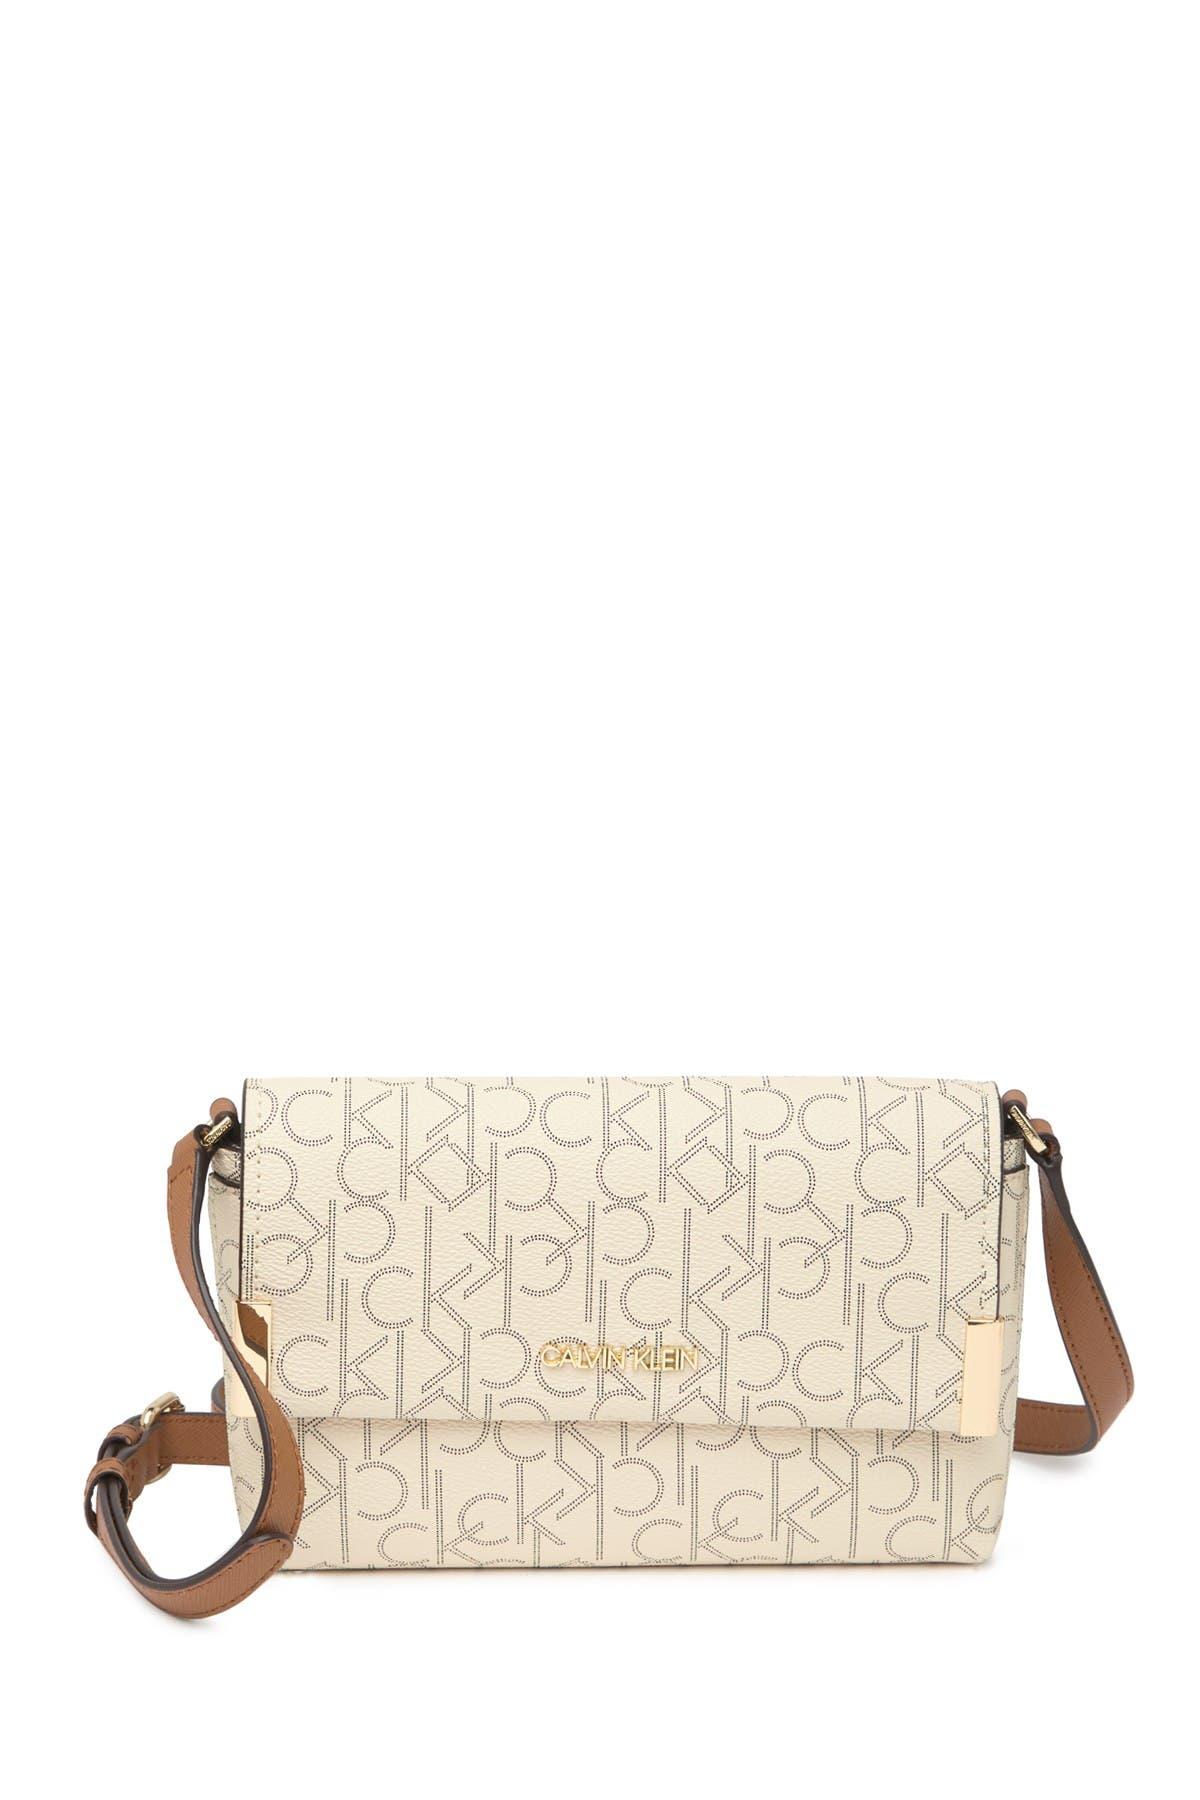 Calvin Klein PRINTED PINDOT LOGO CROSSBODY BAG